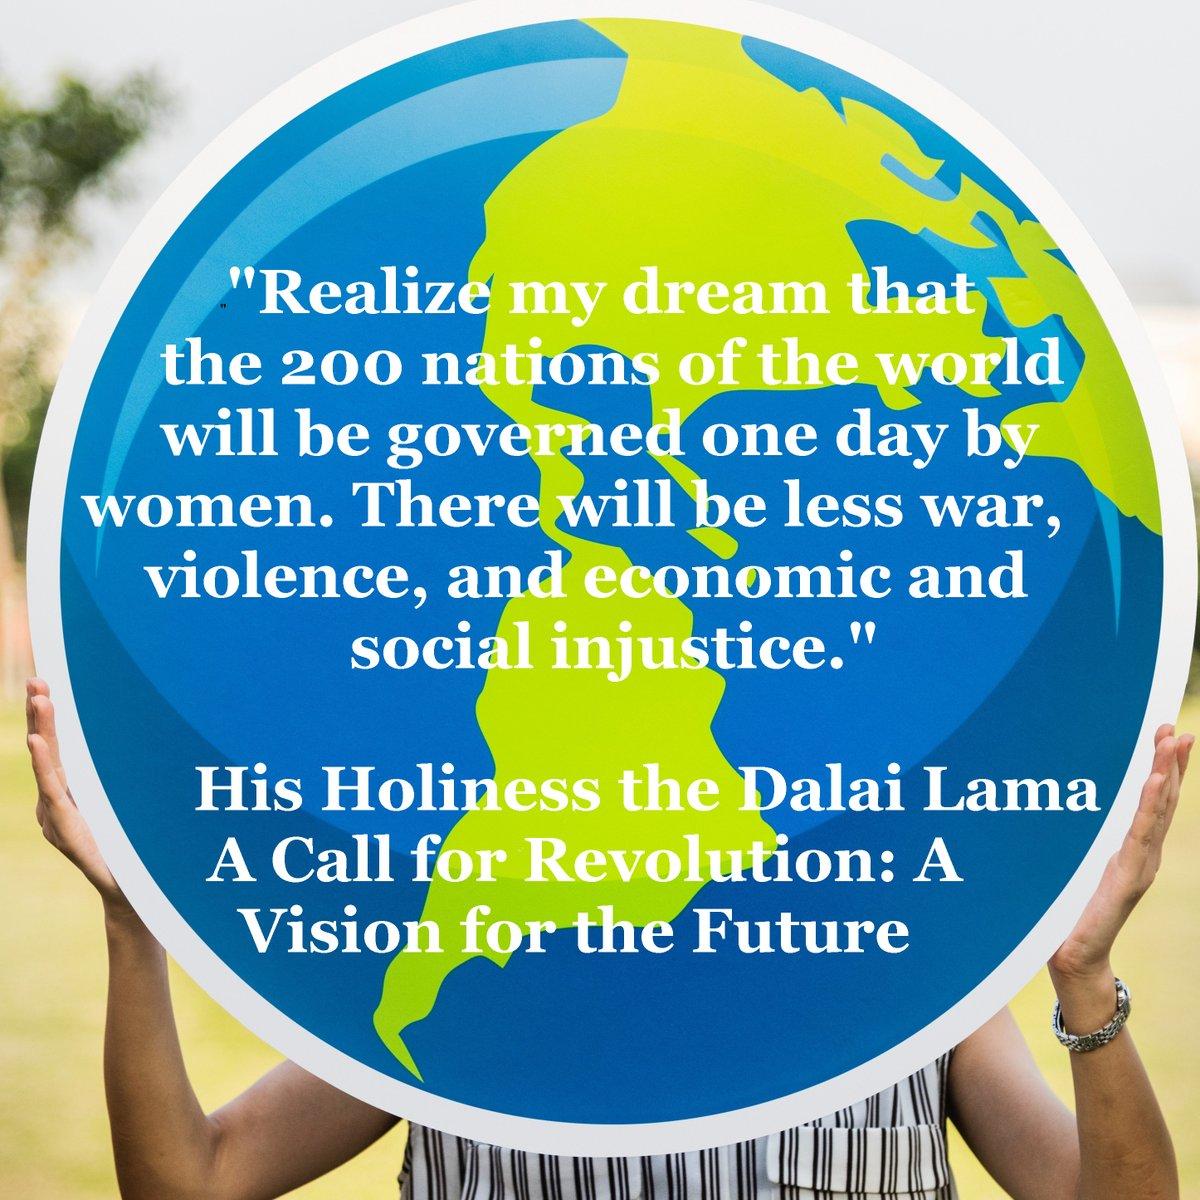 Words by The Dalai Lama, photo by raw pixel, March 8 is International Women's Day. #TrumpisGuilty #SaveDemocracy #truthmatters #republicansaretheproblem #sharethewealth #TaxtheRich #berniesanders #fascism  #democracy #progressive #arrangingdeckchairsonthetitanic #socialjustice